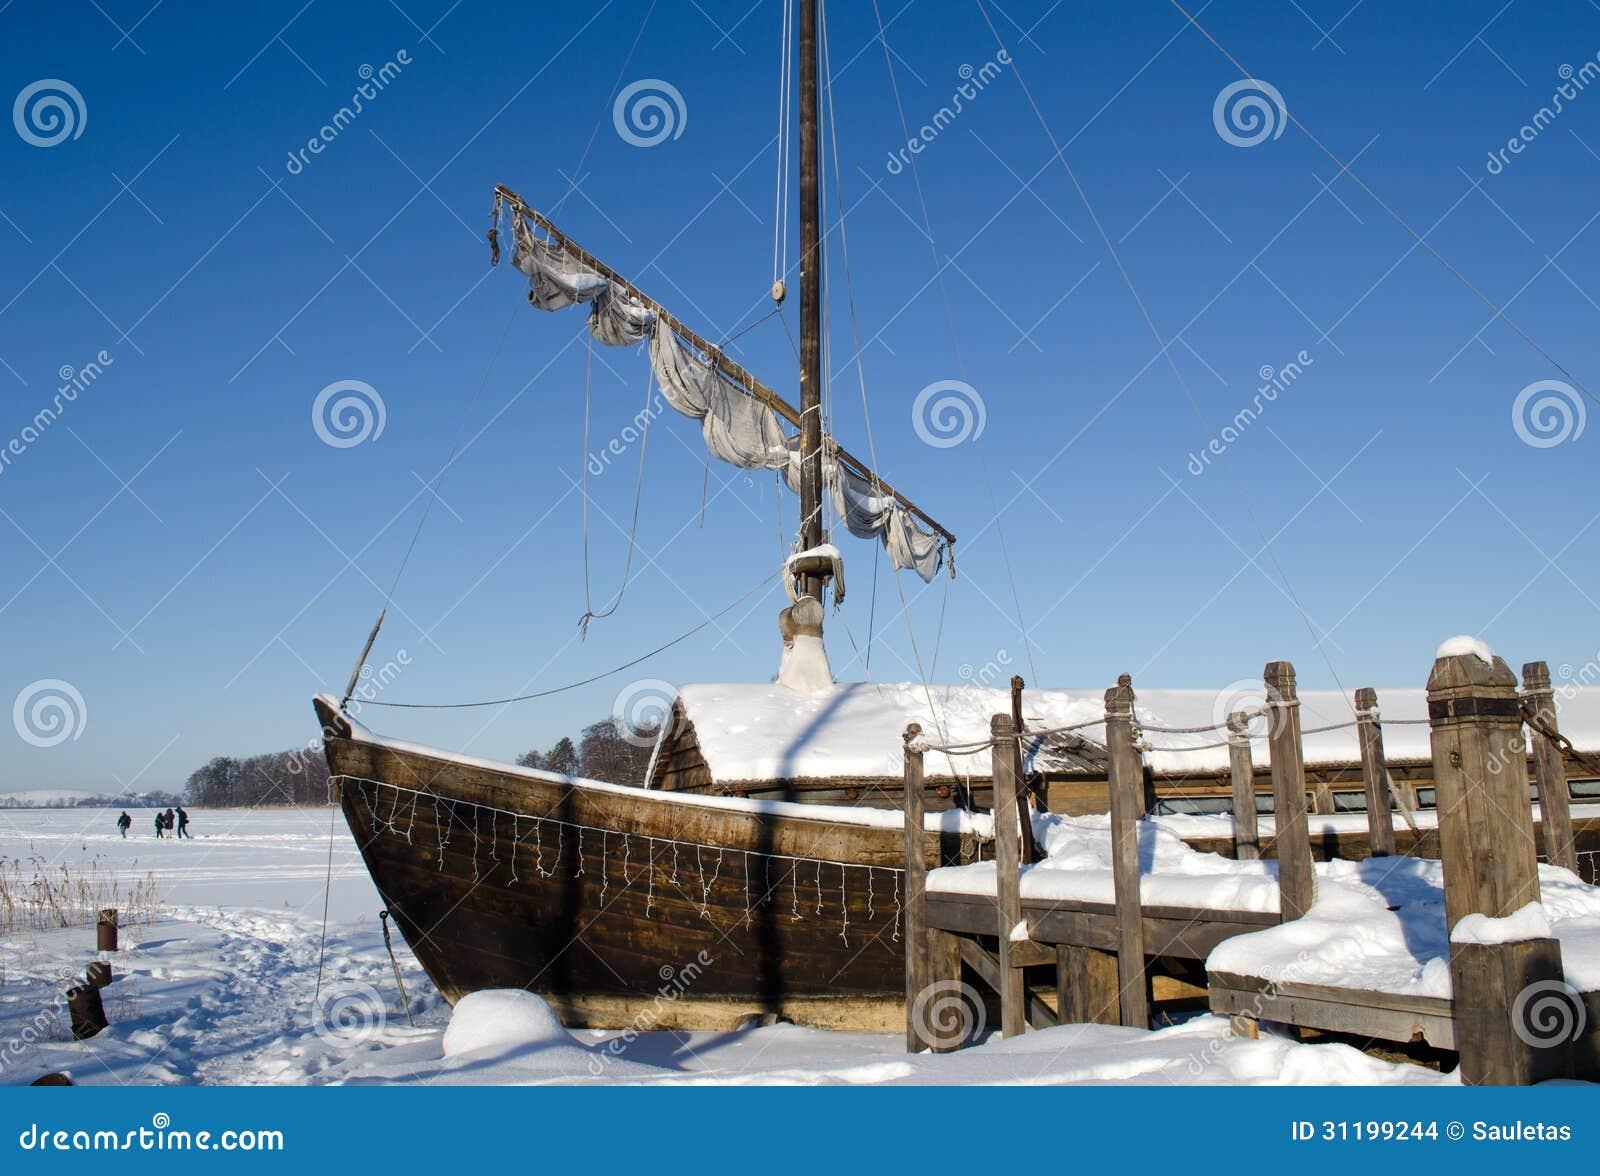 Retro Wooden Ship Frozen Lake Ice Sail People Walk Stock Photo - Image: 31199244